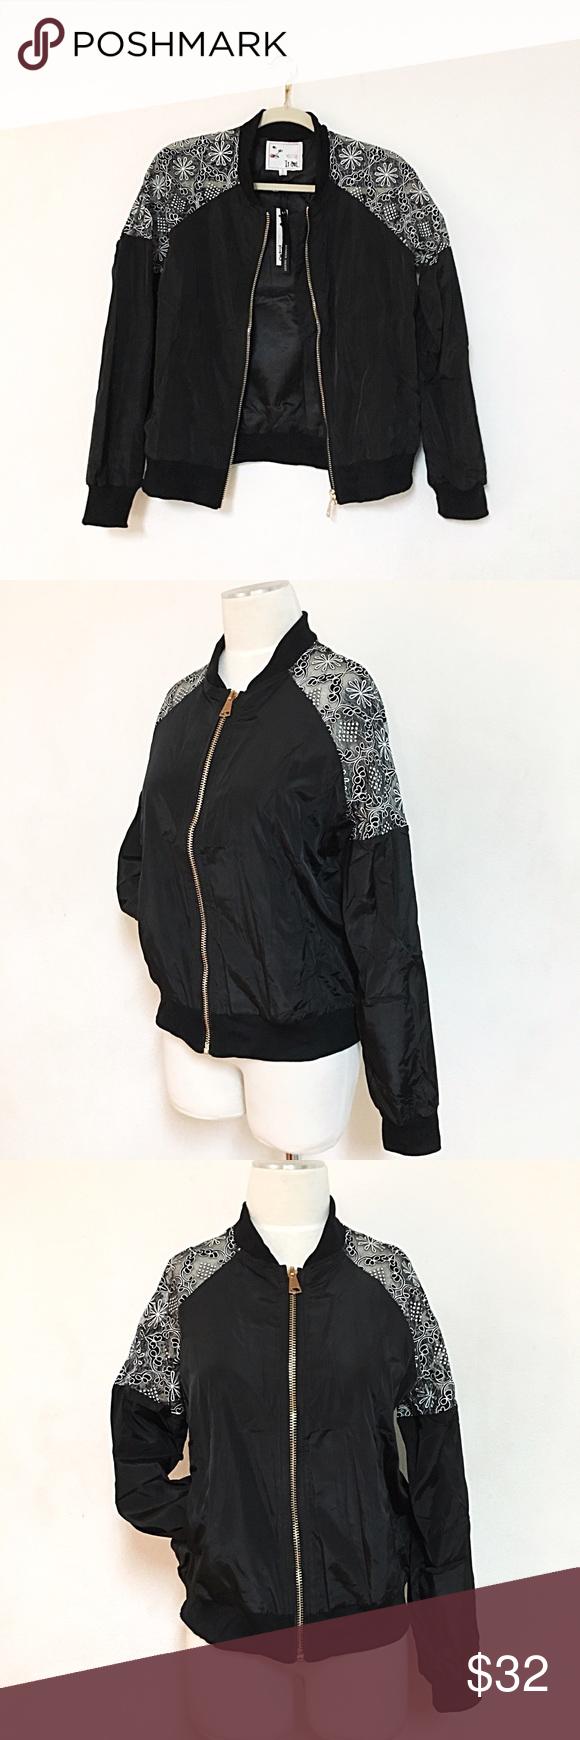 Mesh shoulder mock lace bomber jacket NWT (With images